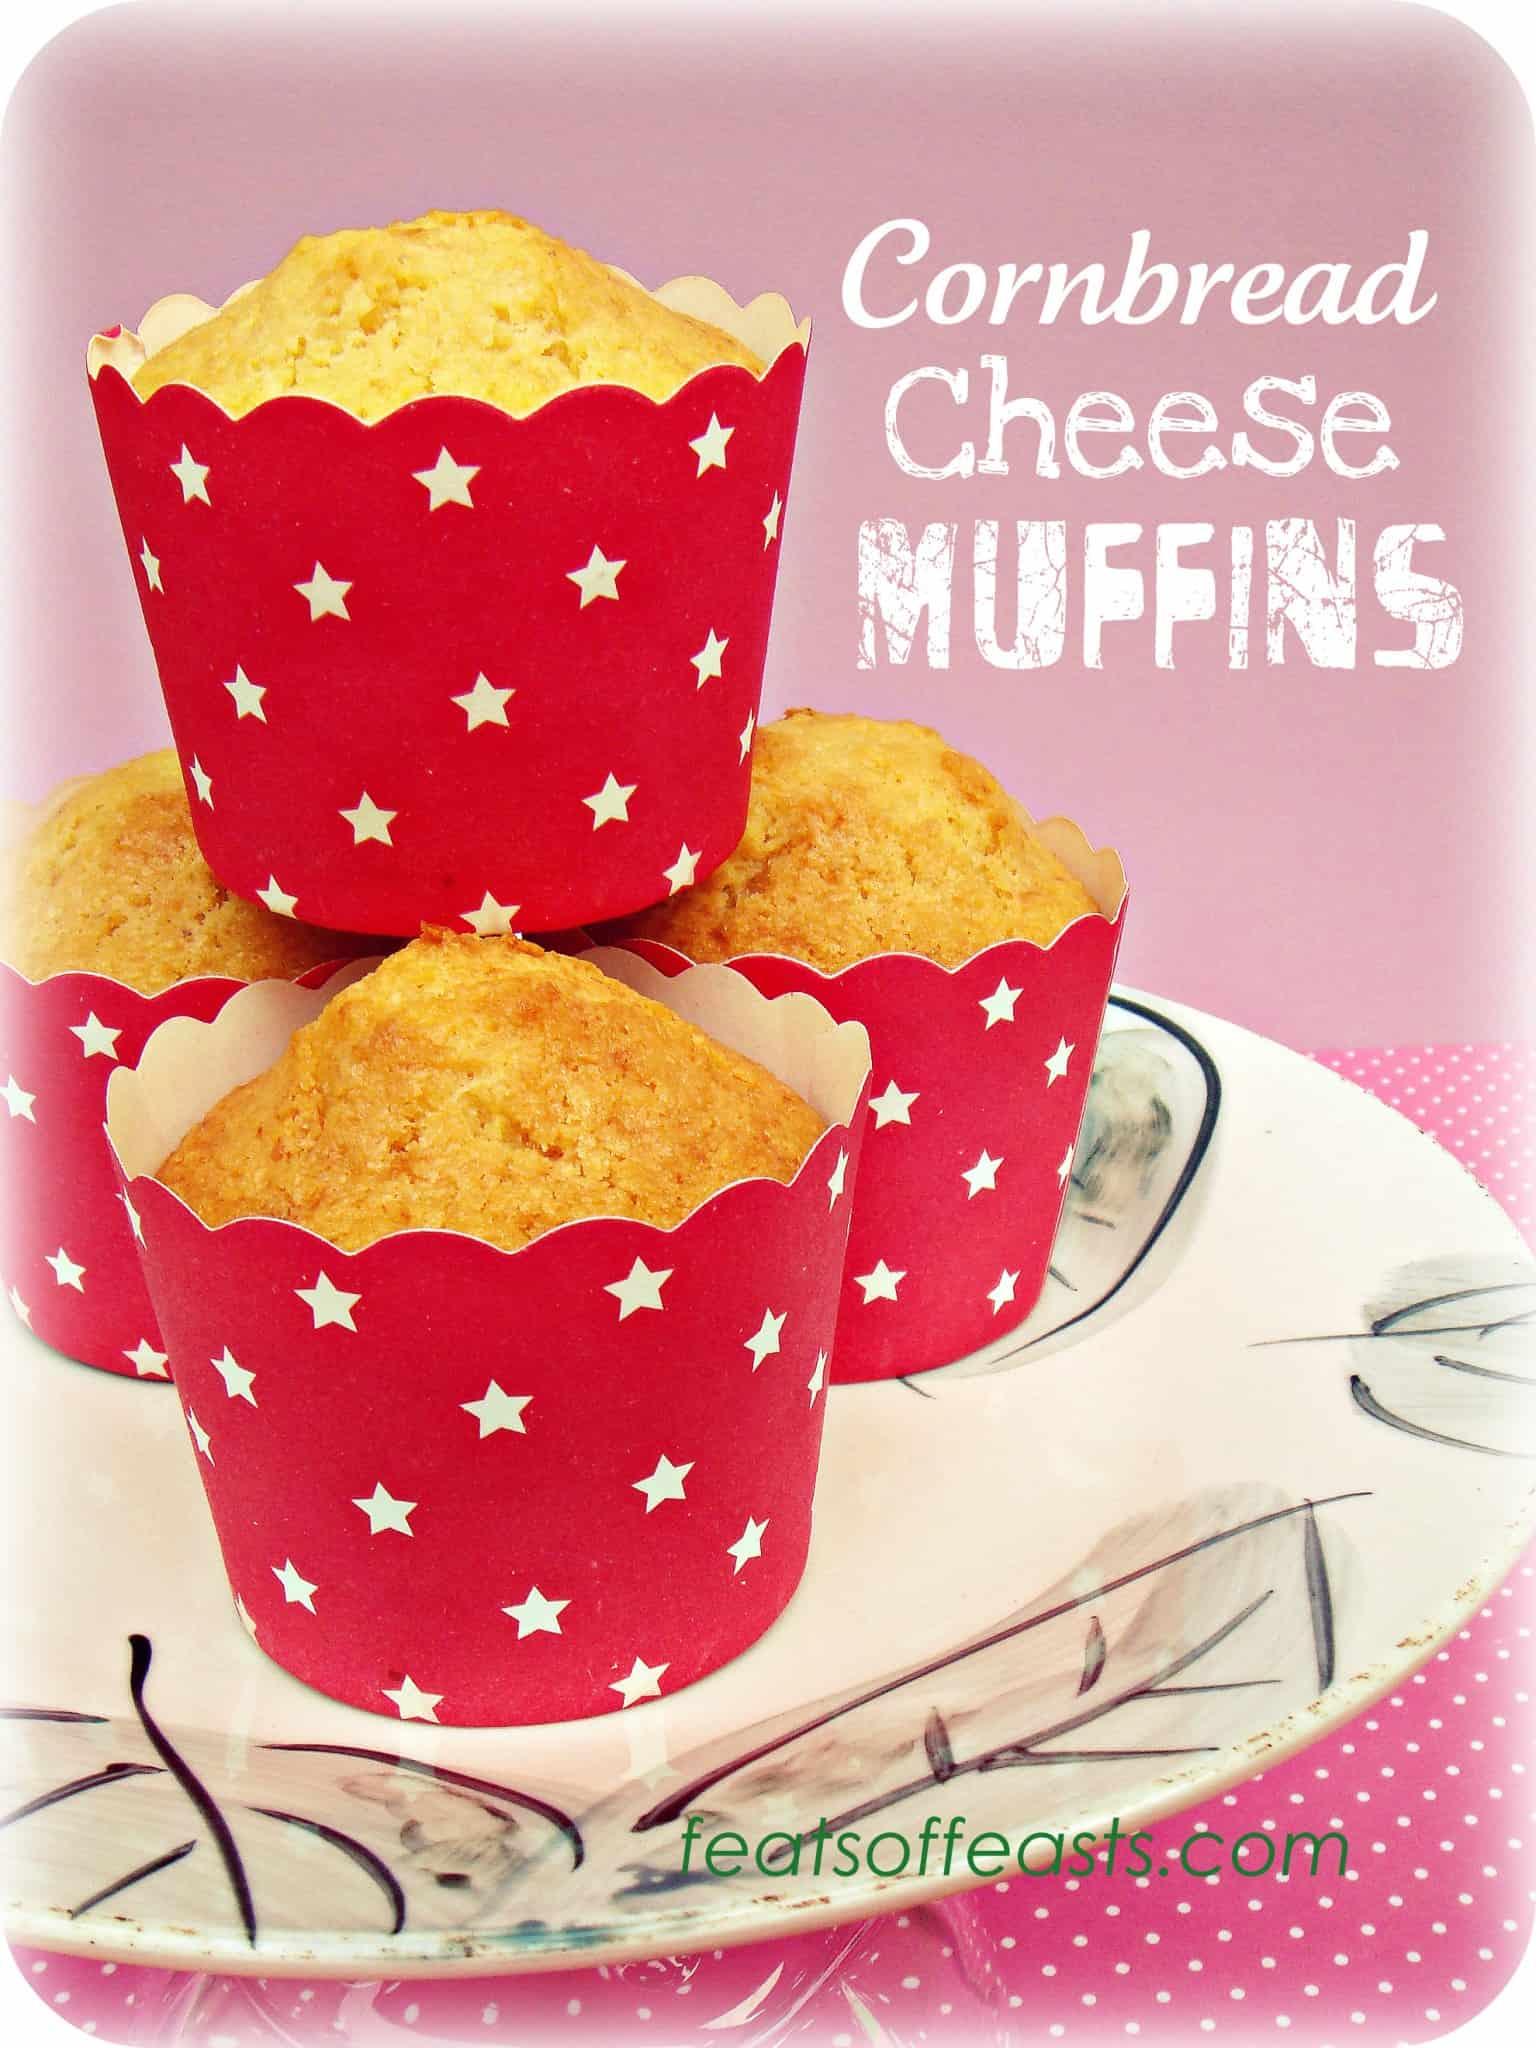 Cornbread Cheese Muffins